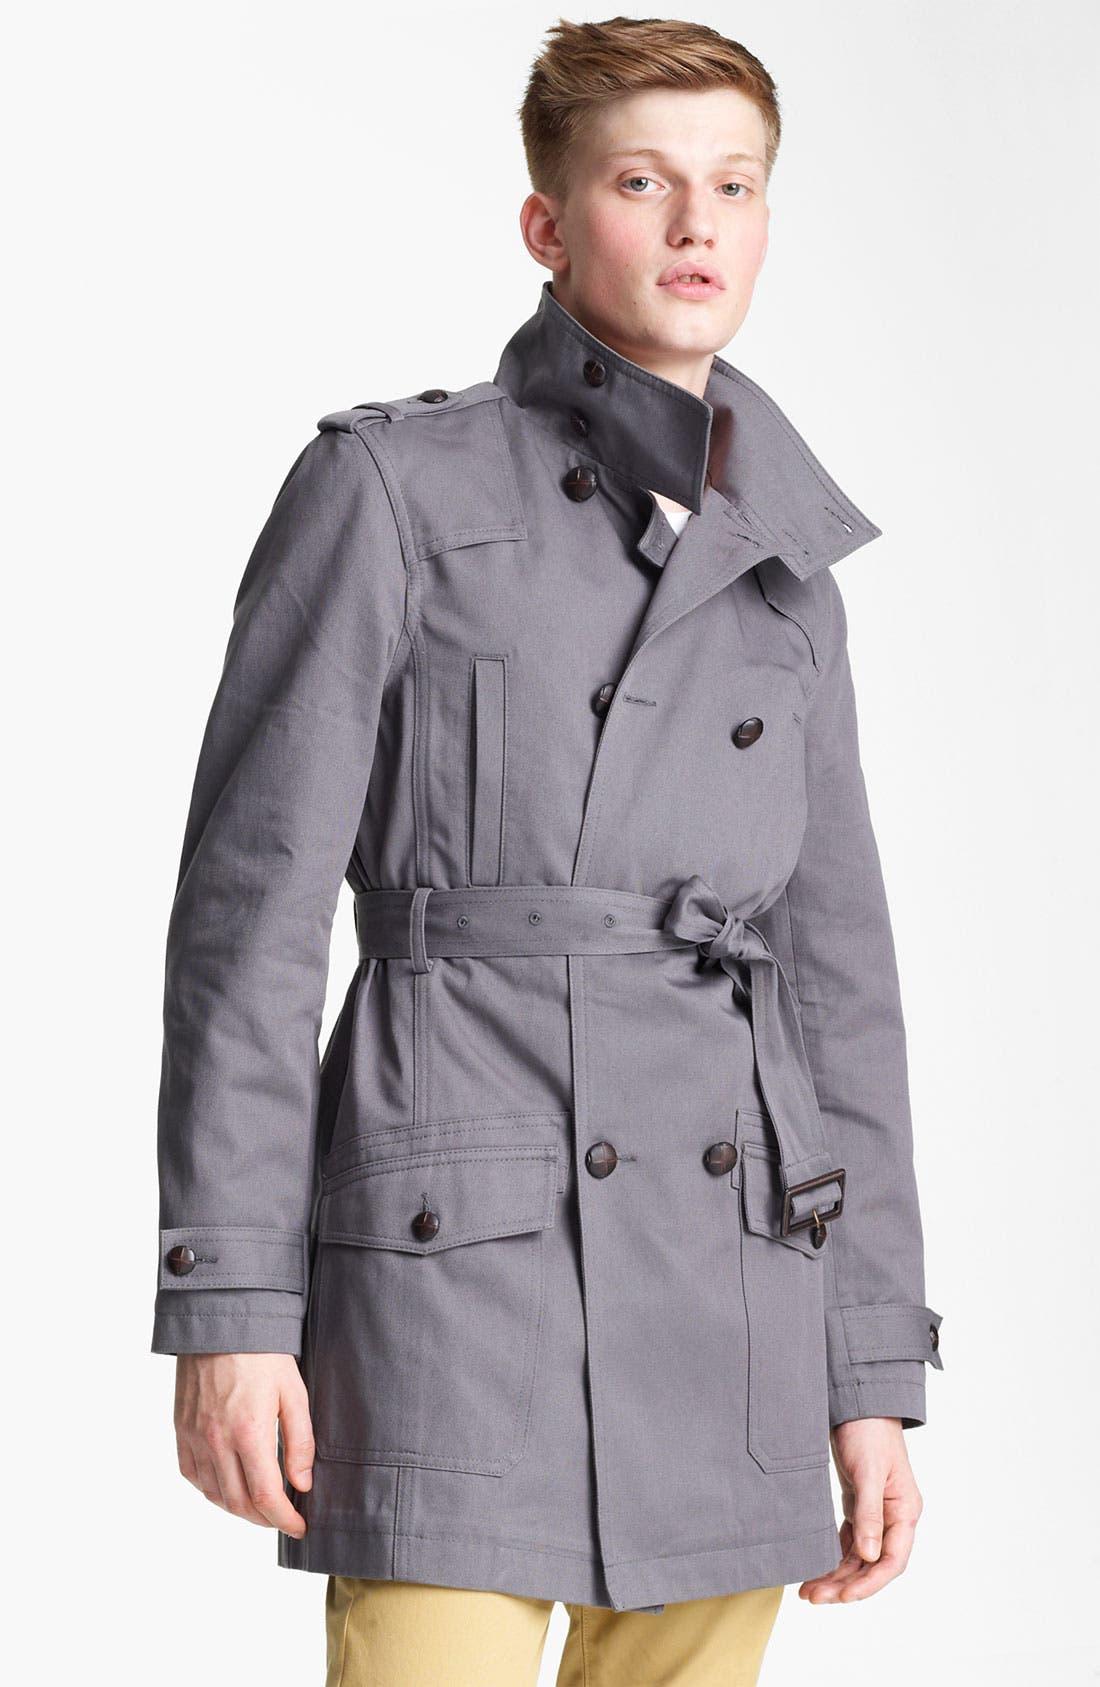 Alternate Image 1 Selected - Topman 'Kennington' Full Length Jacket